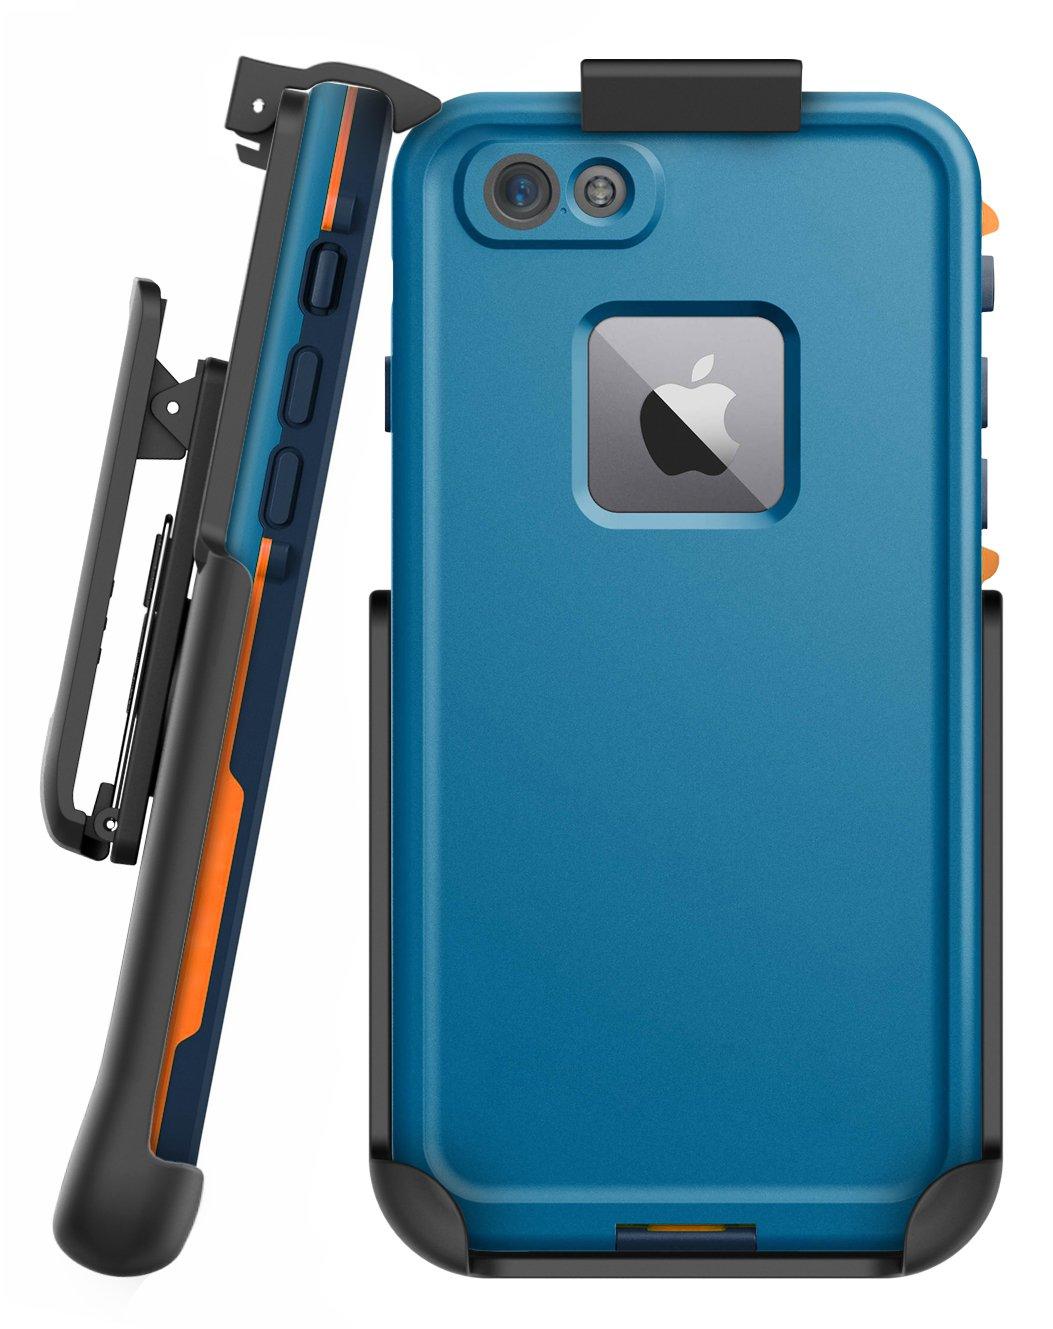 Encased Belt Clip Holster for LifeProof FRE - iPhone 7 (4.7'') (case sold separately)